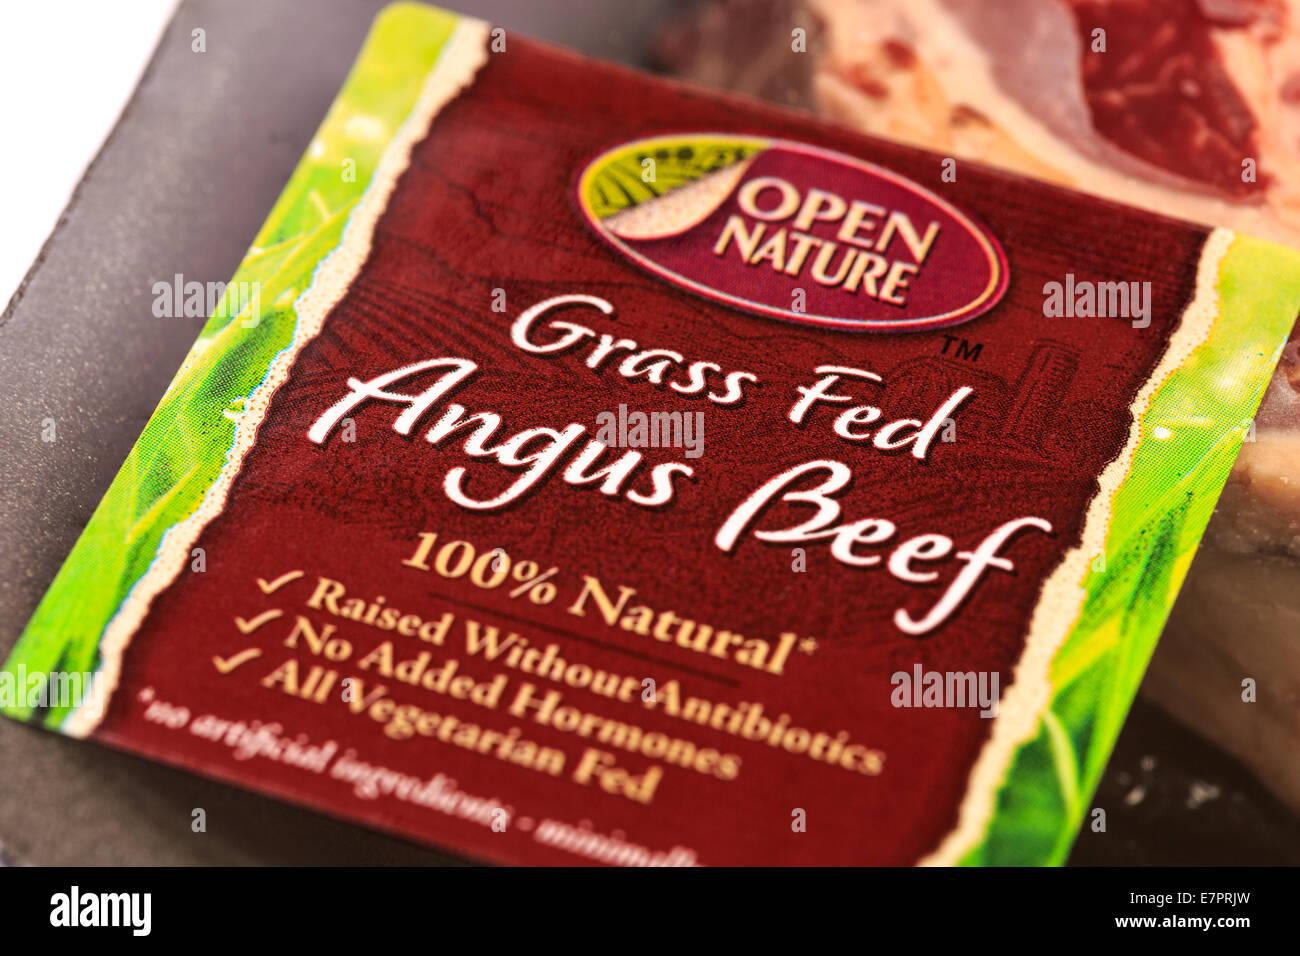 Open Nature Grass Fed Angus Beef Ribeye Steak Stock Photo